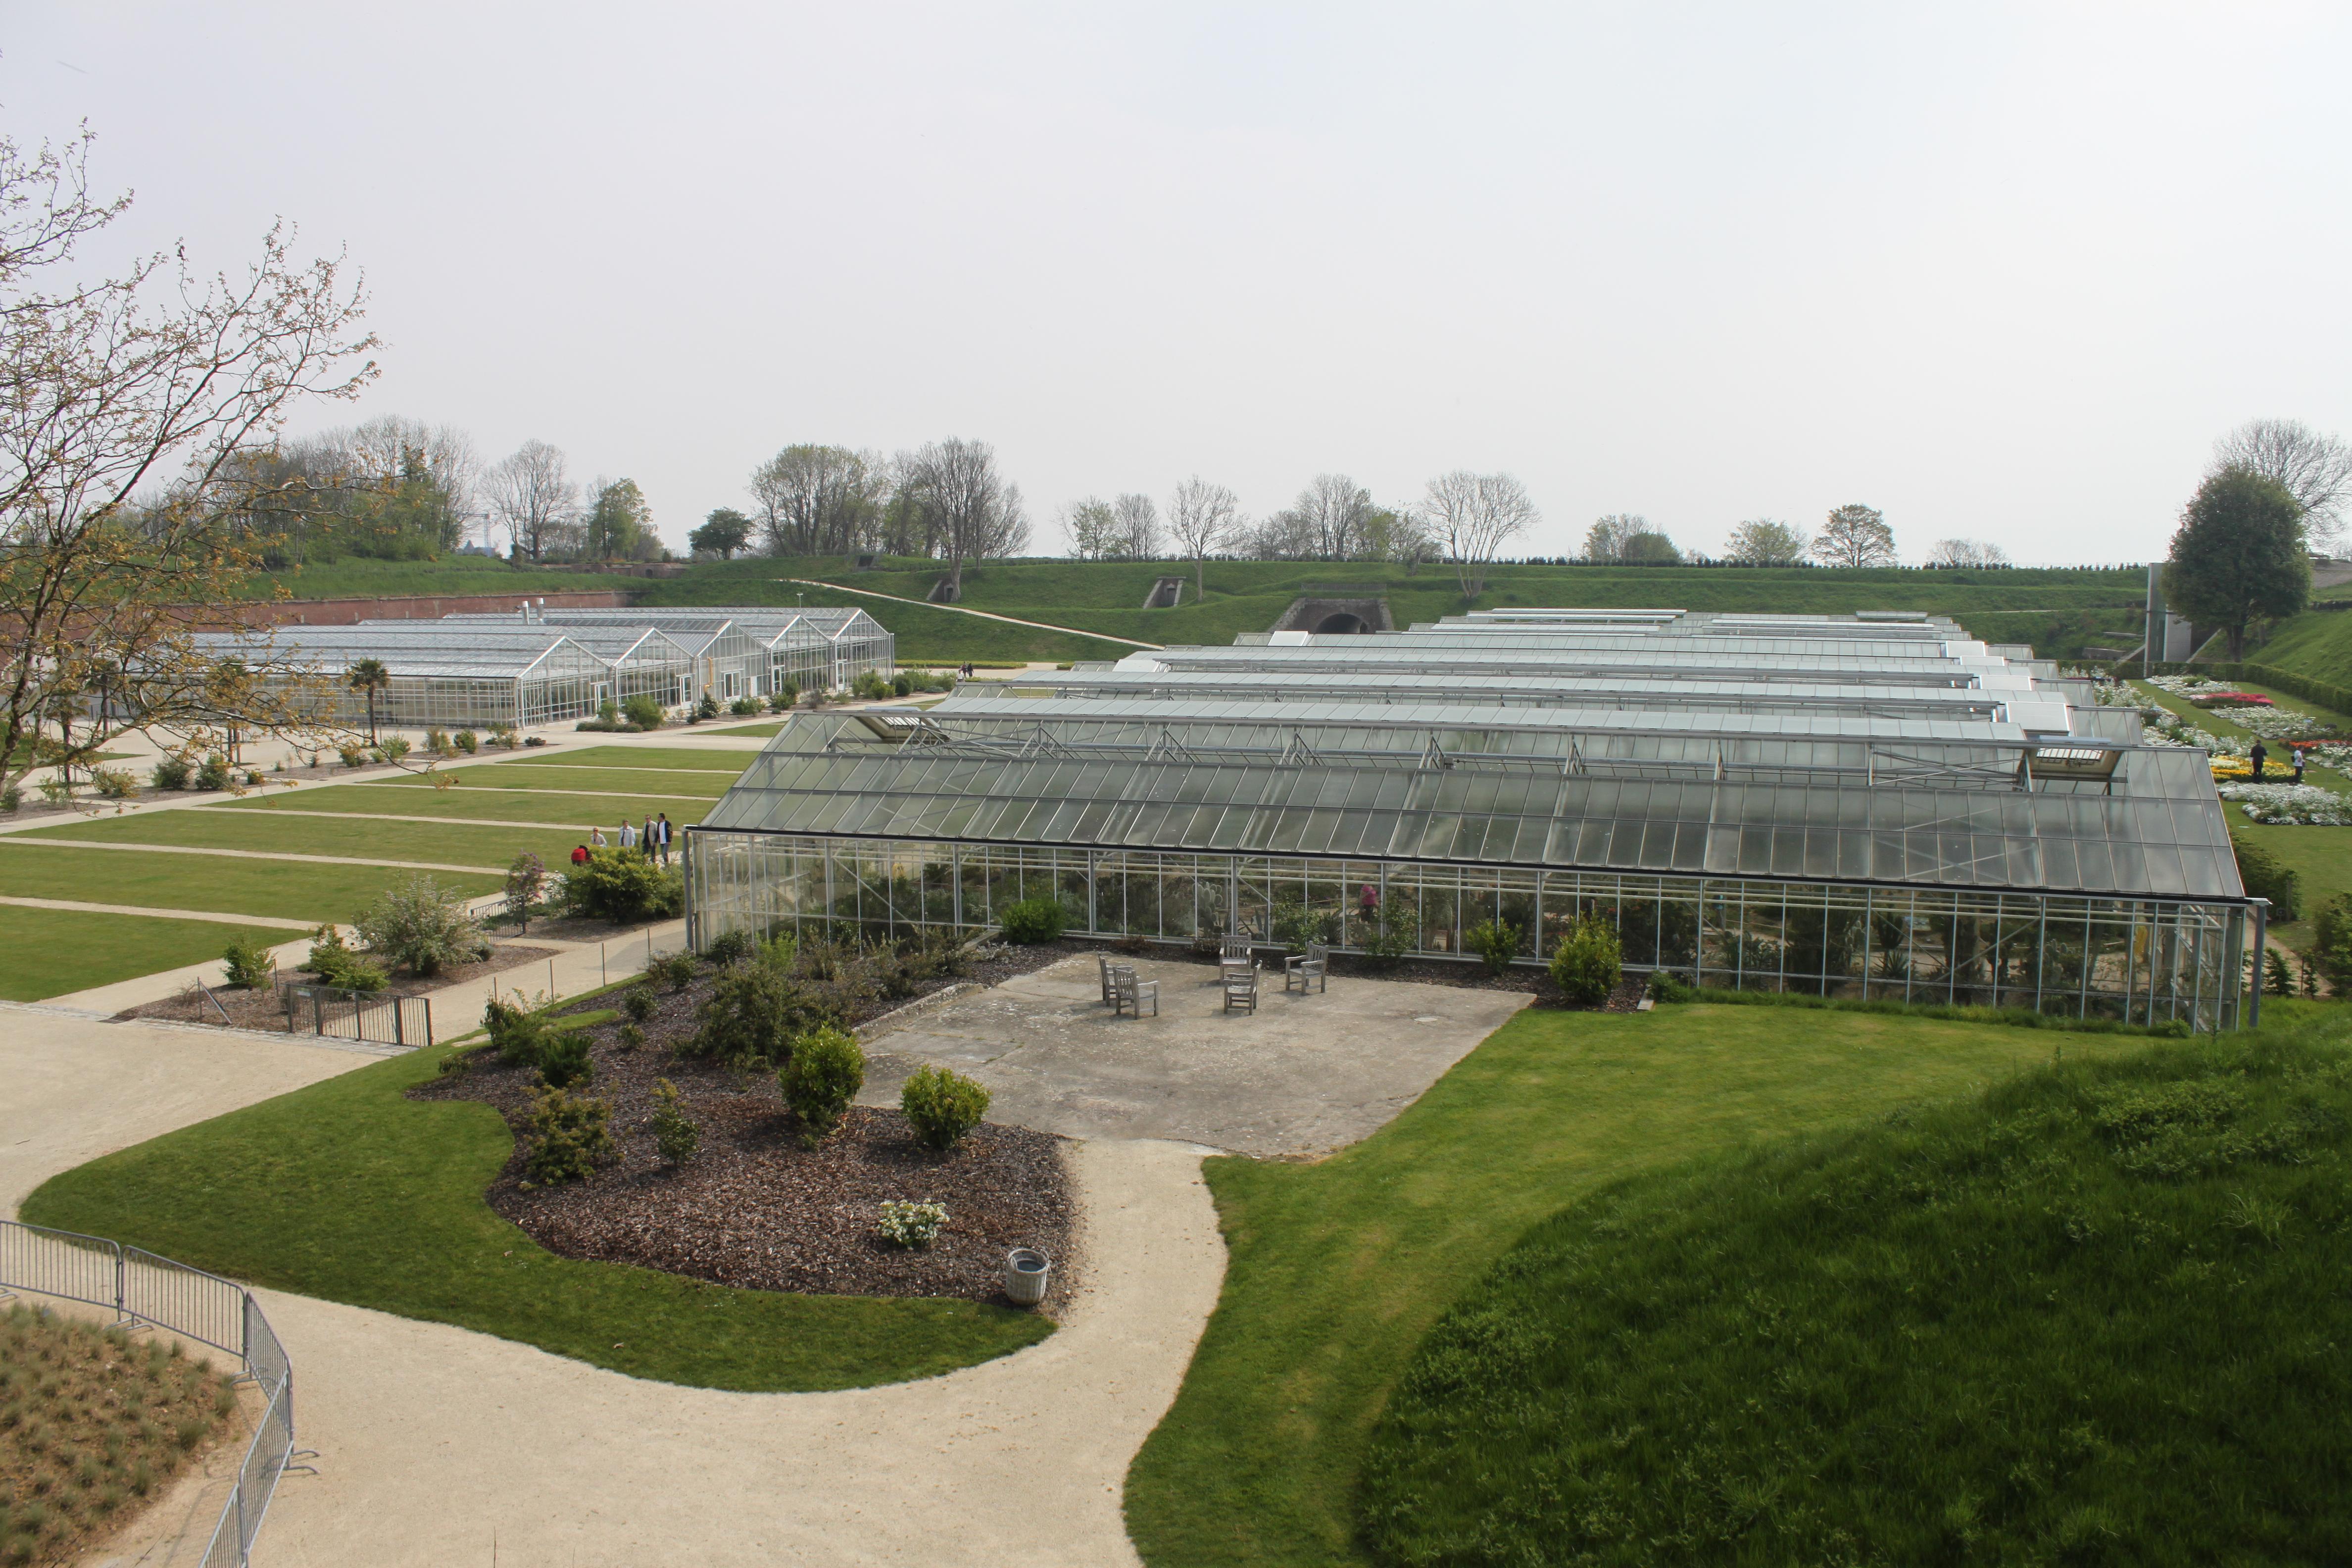 Archivo le havre jardins wikipedia la enciclopedia libre - Jardin fleurie le havre ...